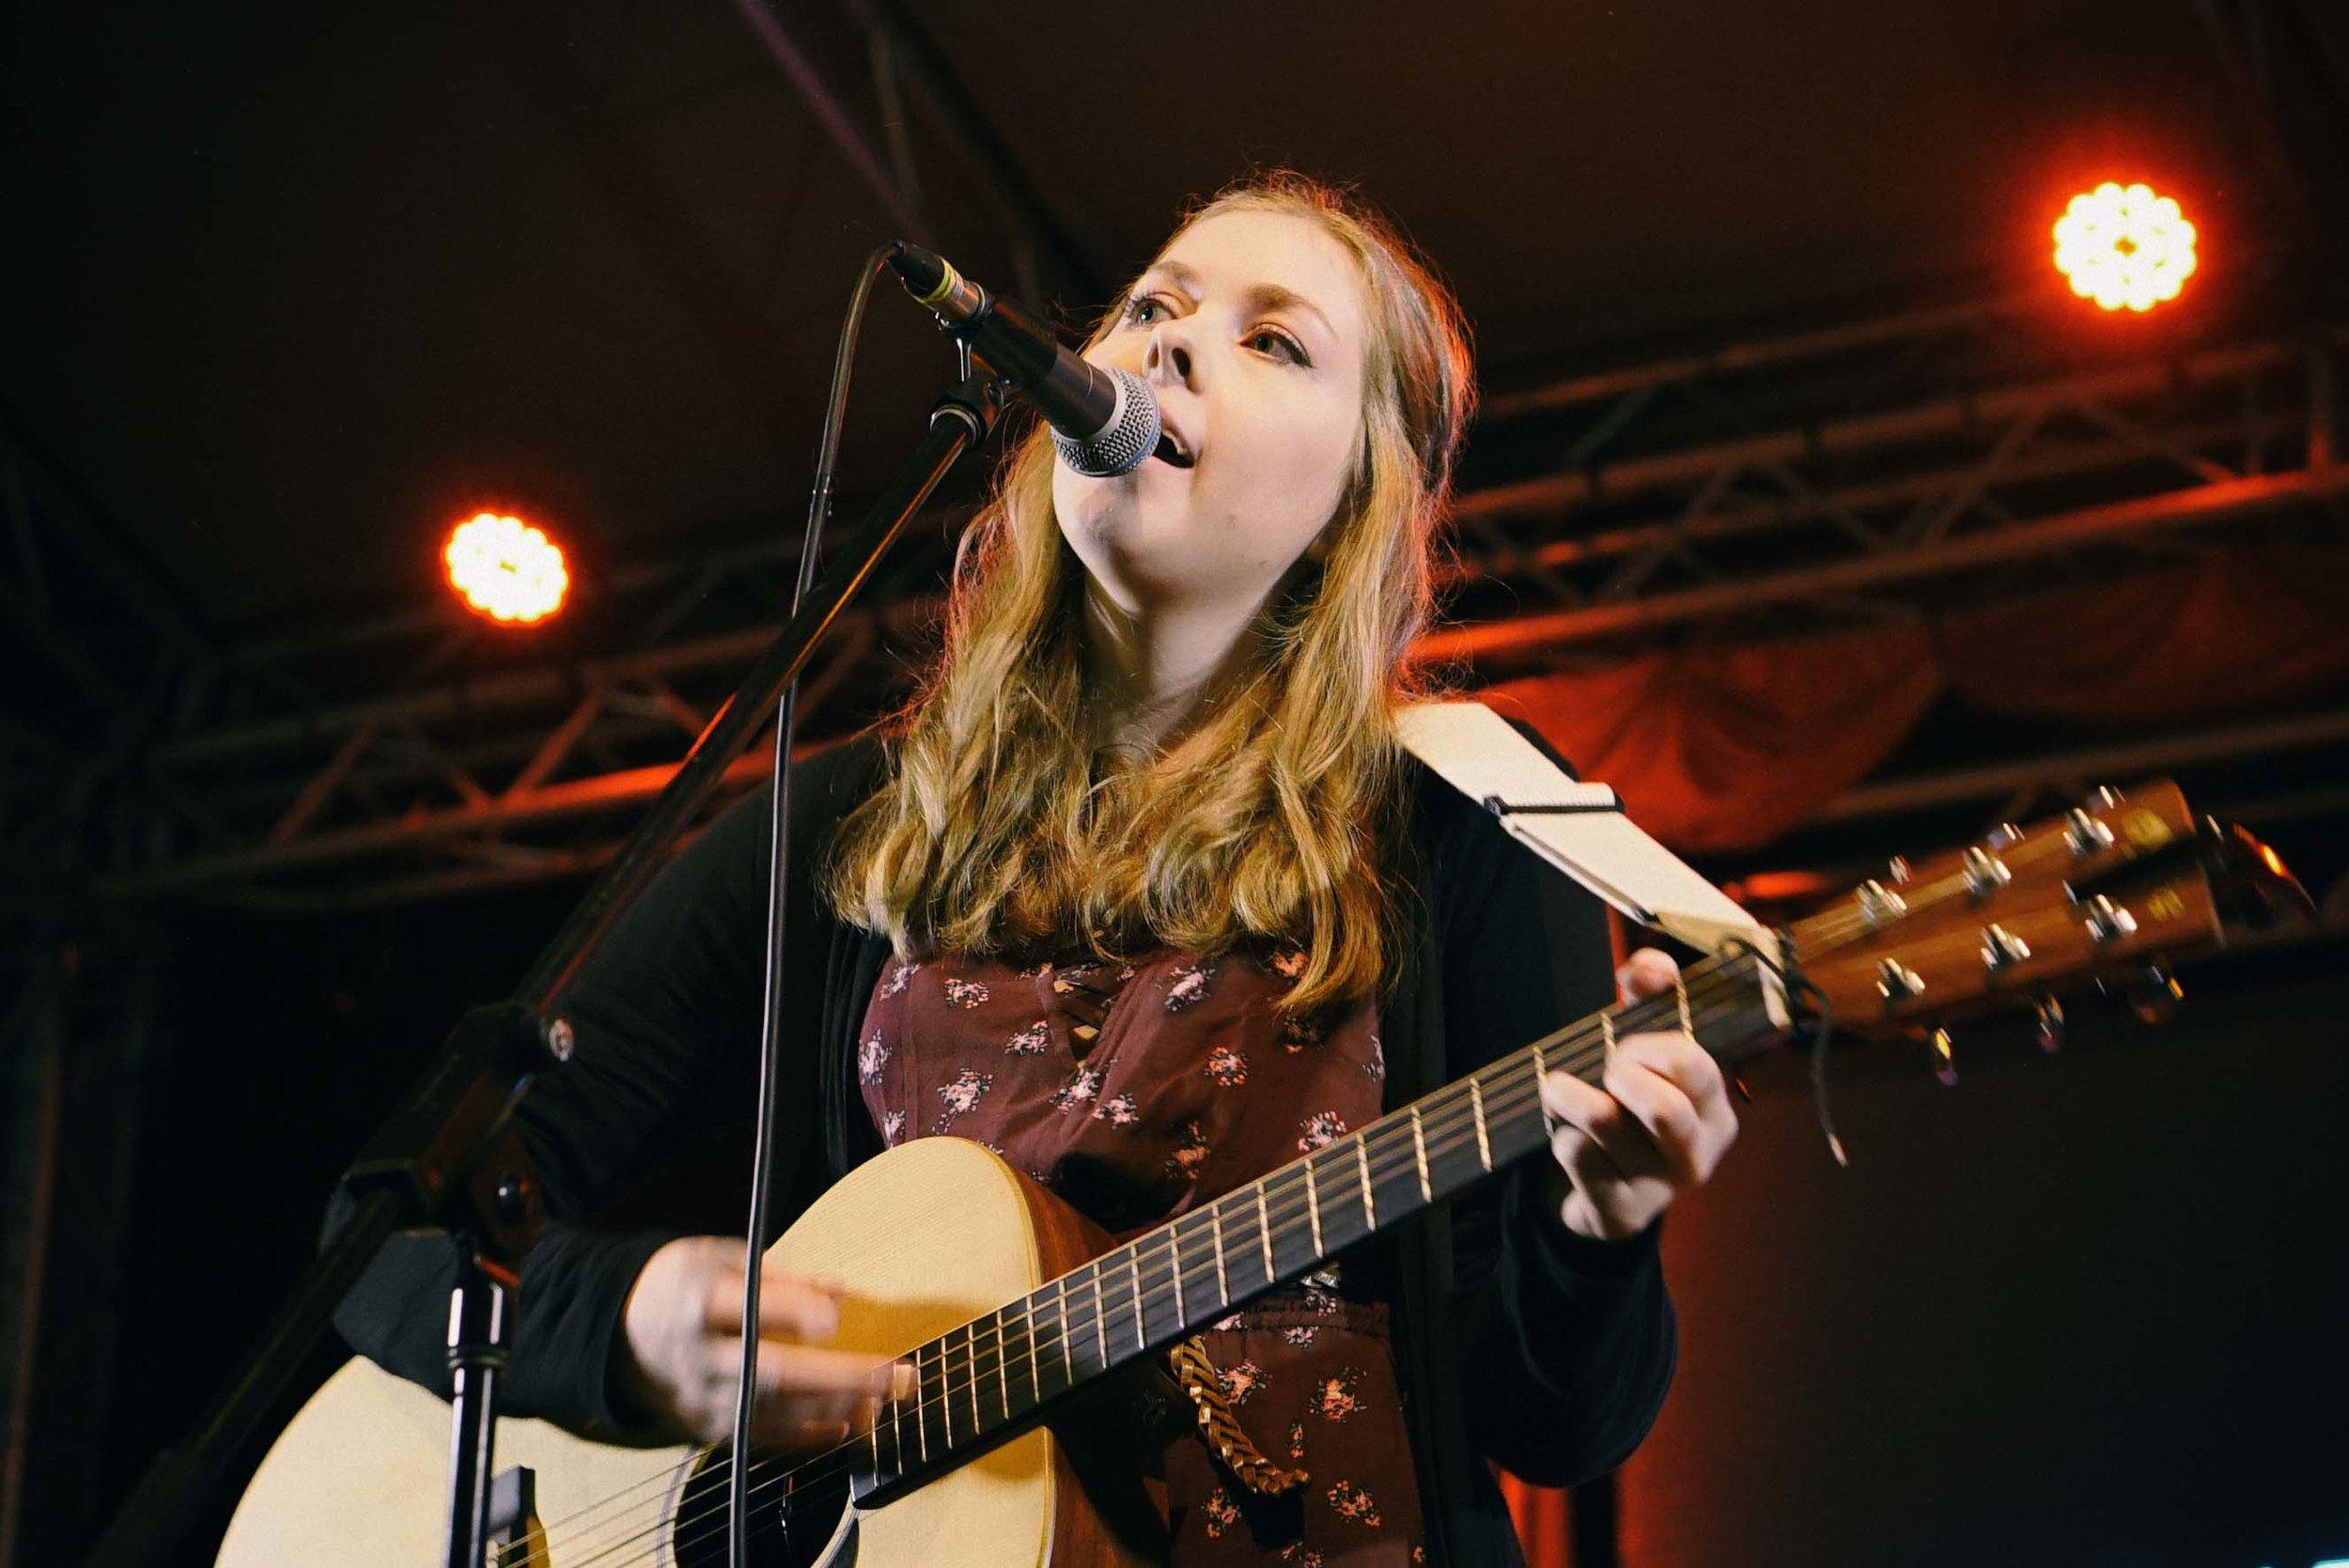 Kaitlyn Martin at NightQuarter 2018